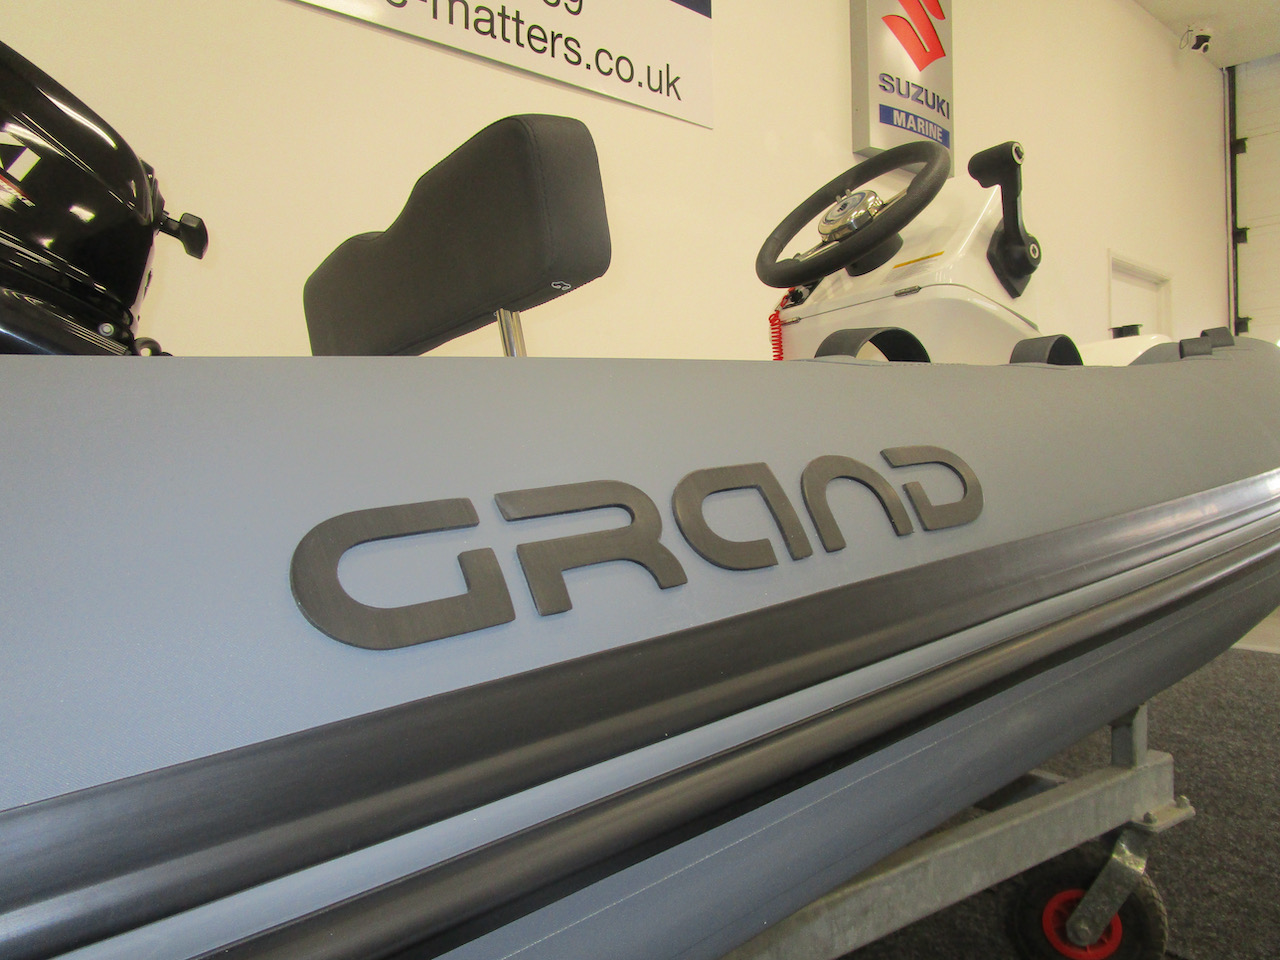 GRAND S300 RIB tubes